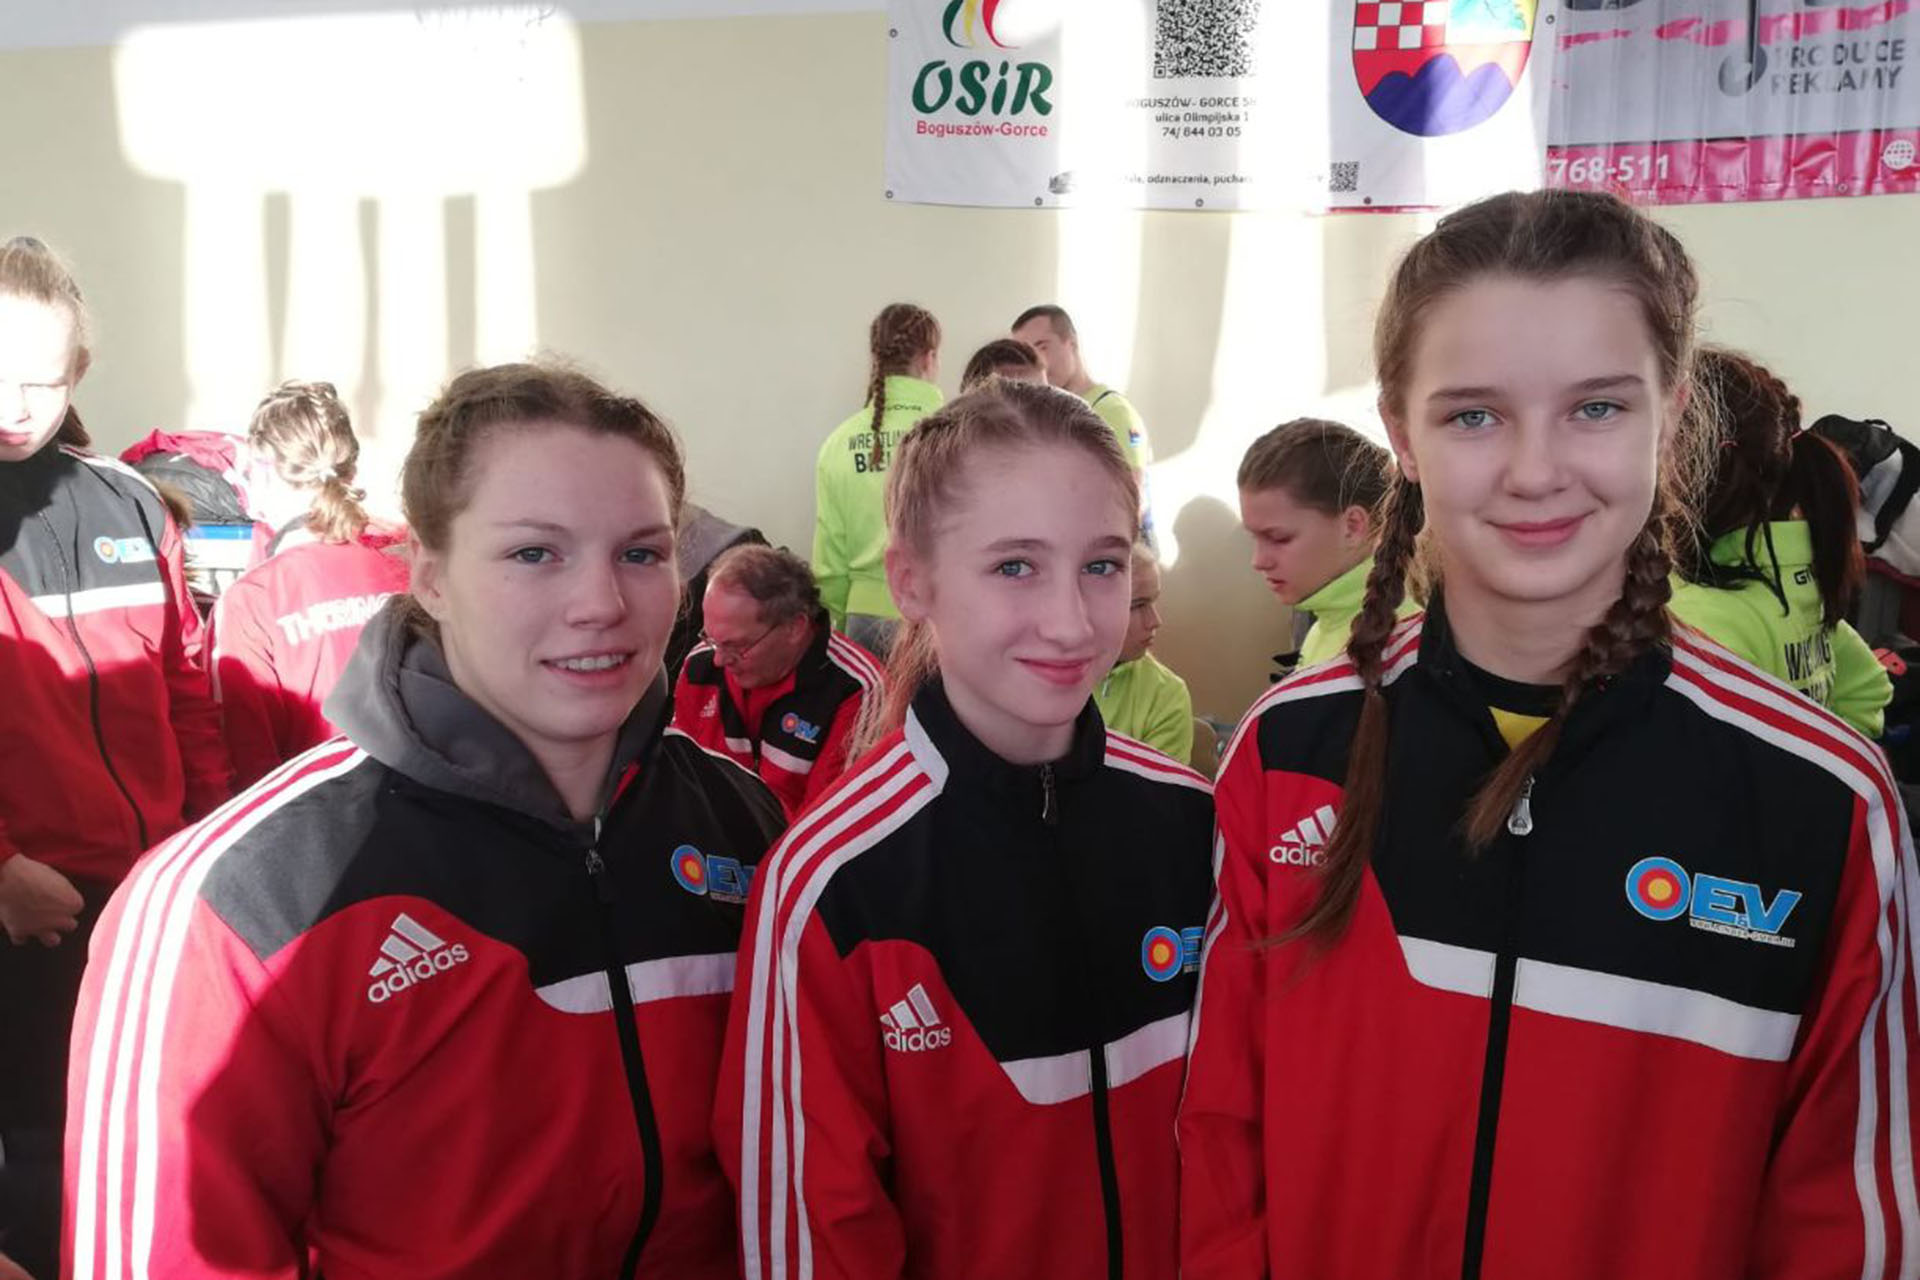 Die Greizer Starter bei den HEROS Lady Open 2019 in Czarny Bór Polen